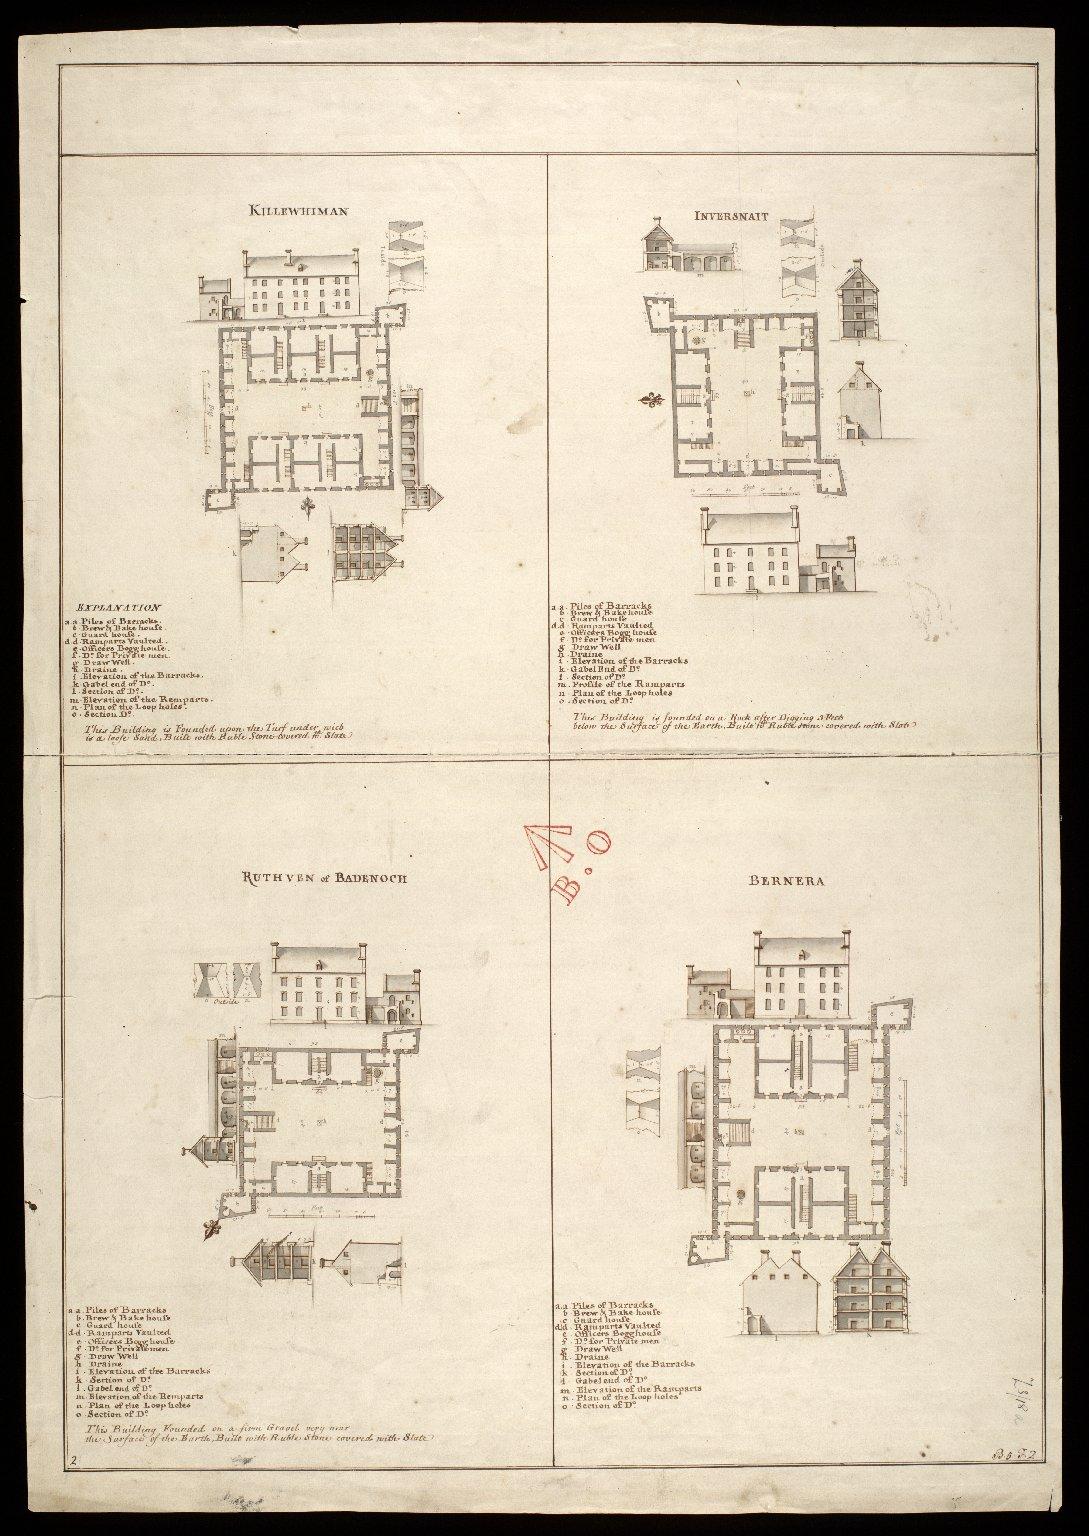 Killewhiman [i.e. Kiliwhimen], Inversnait [i.e. Inversnaid], Ruthven of Badenoch, Bernera [copy] [1 of 1]